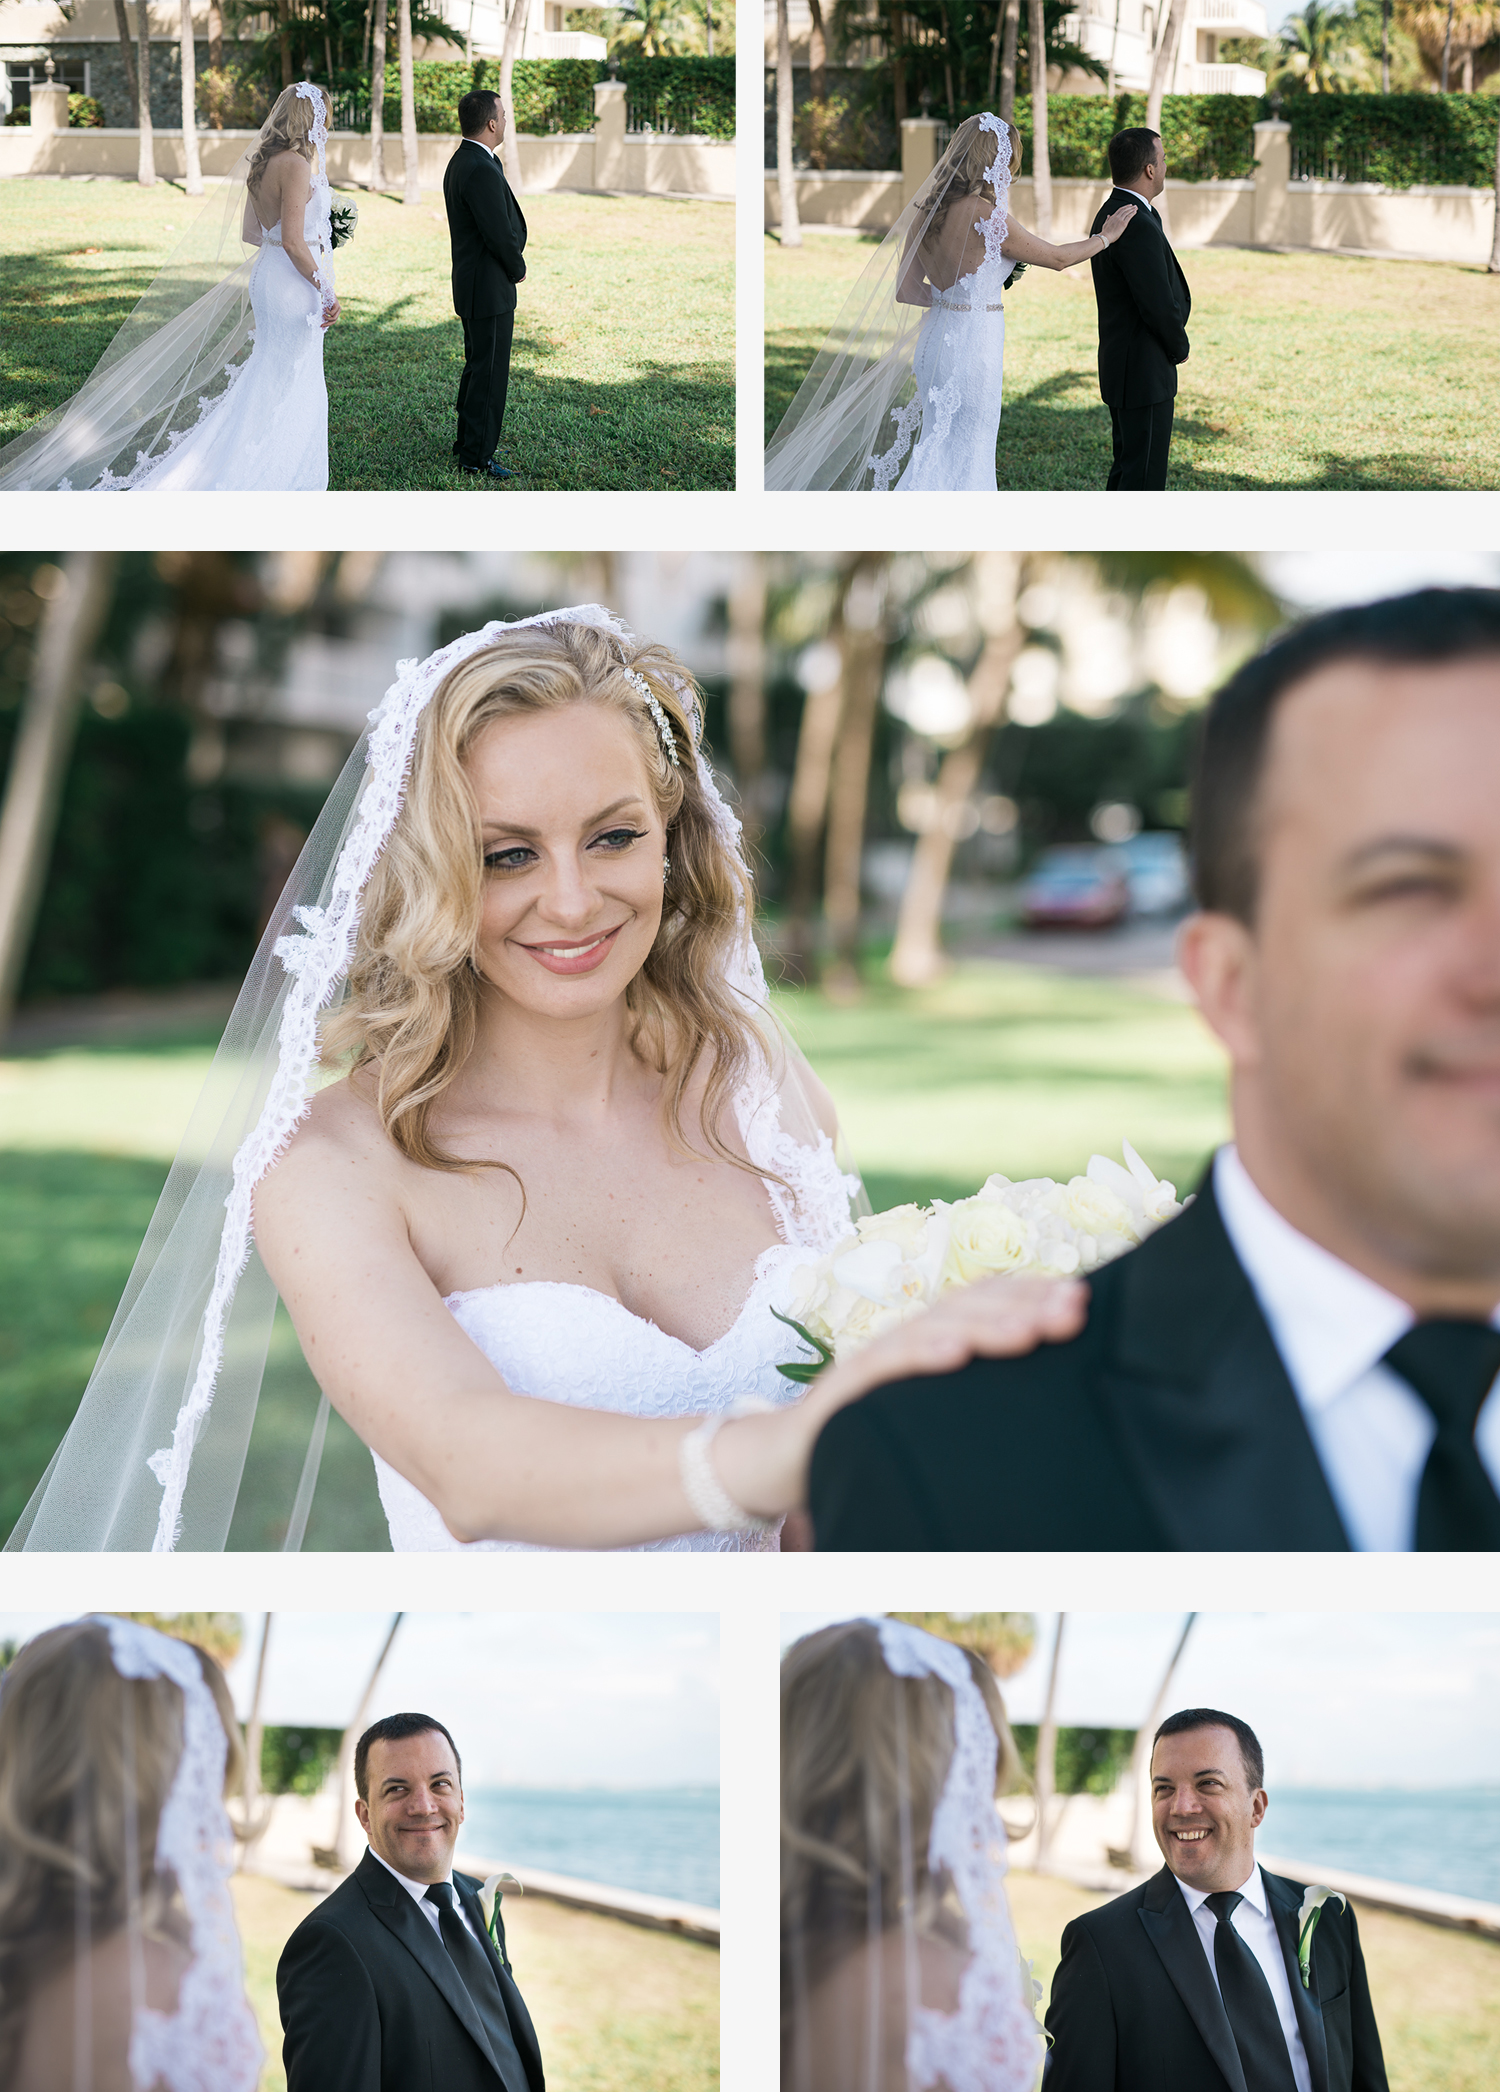 brandwold.se-miami-wedding-fortlauderdale-25